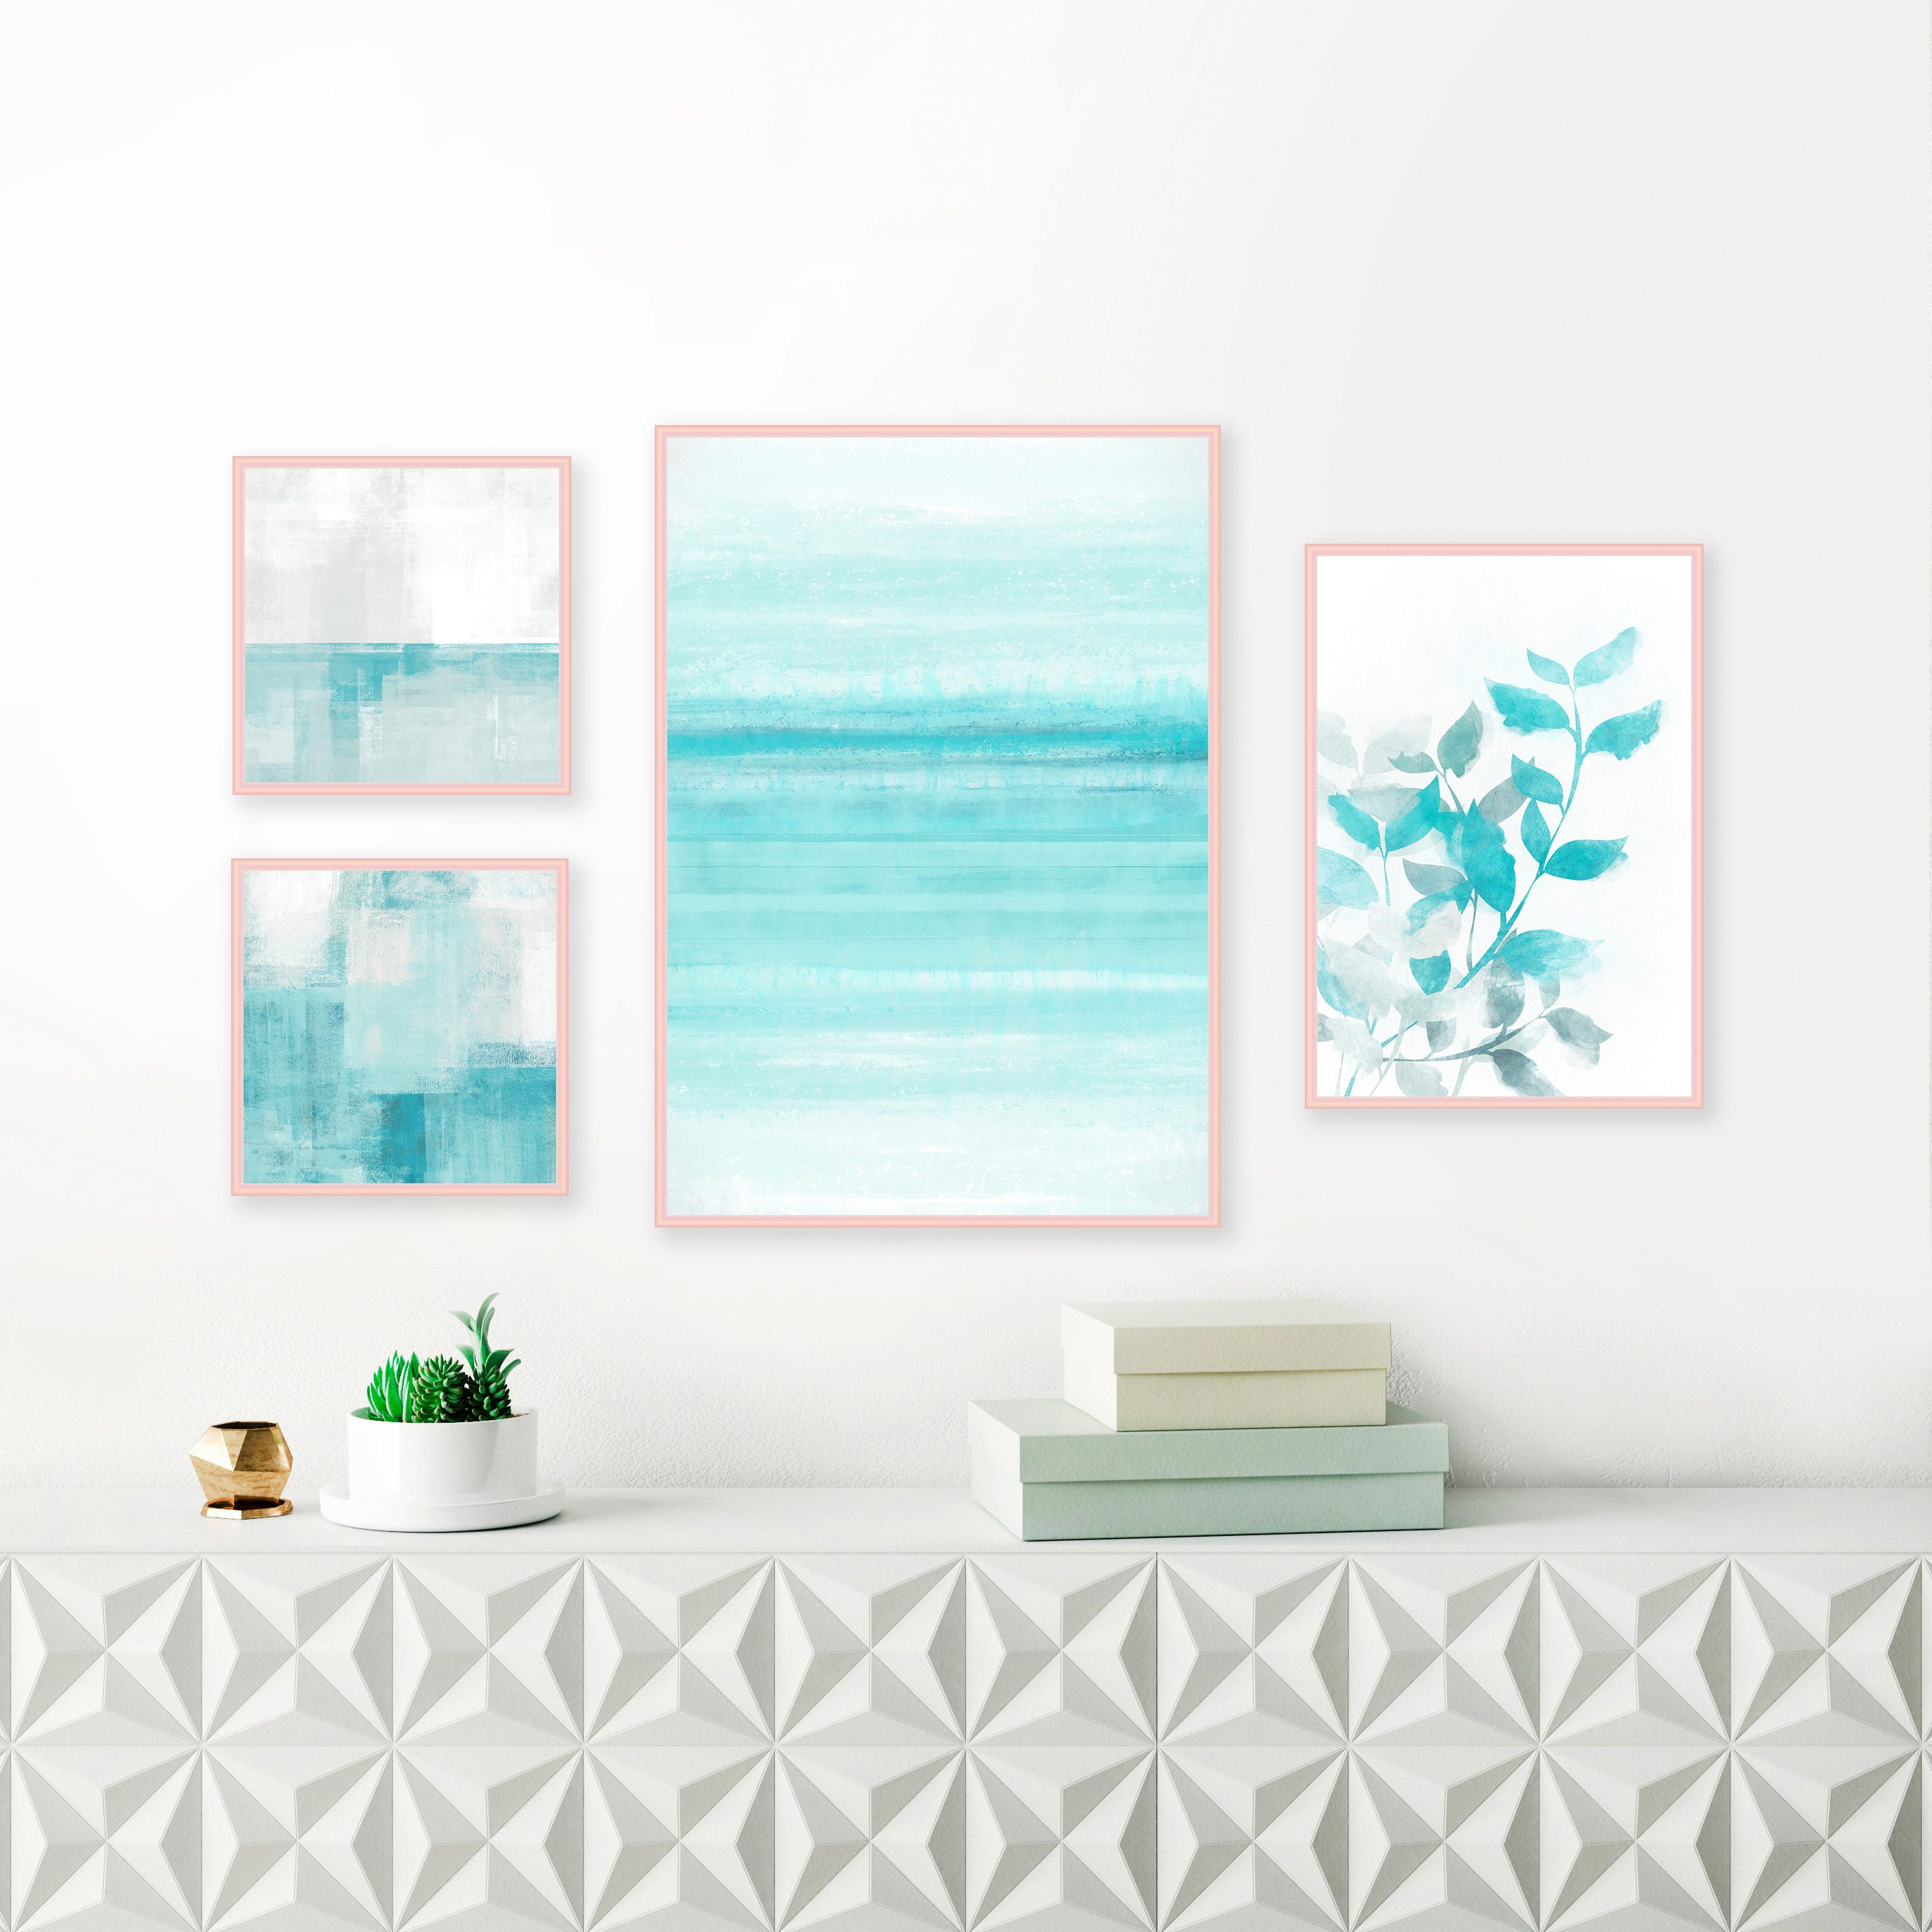 Aqua Gallery Wall Prints, Set of 4 Printable Abstract Artworks ...